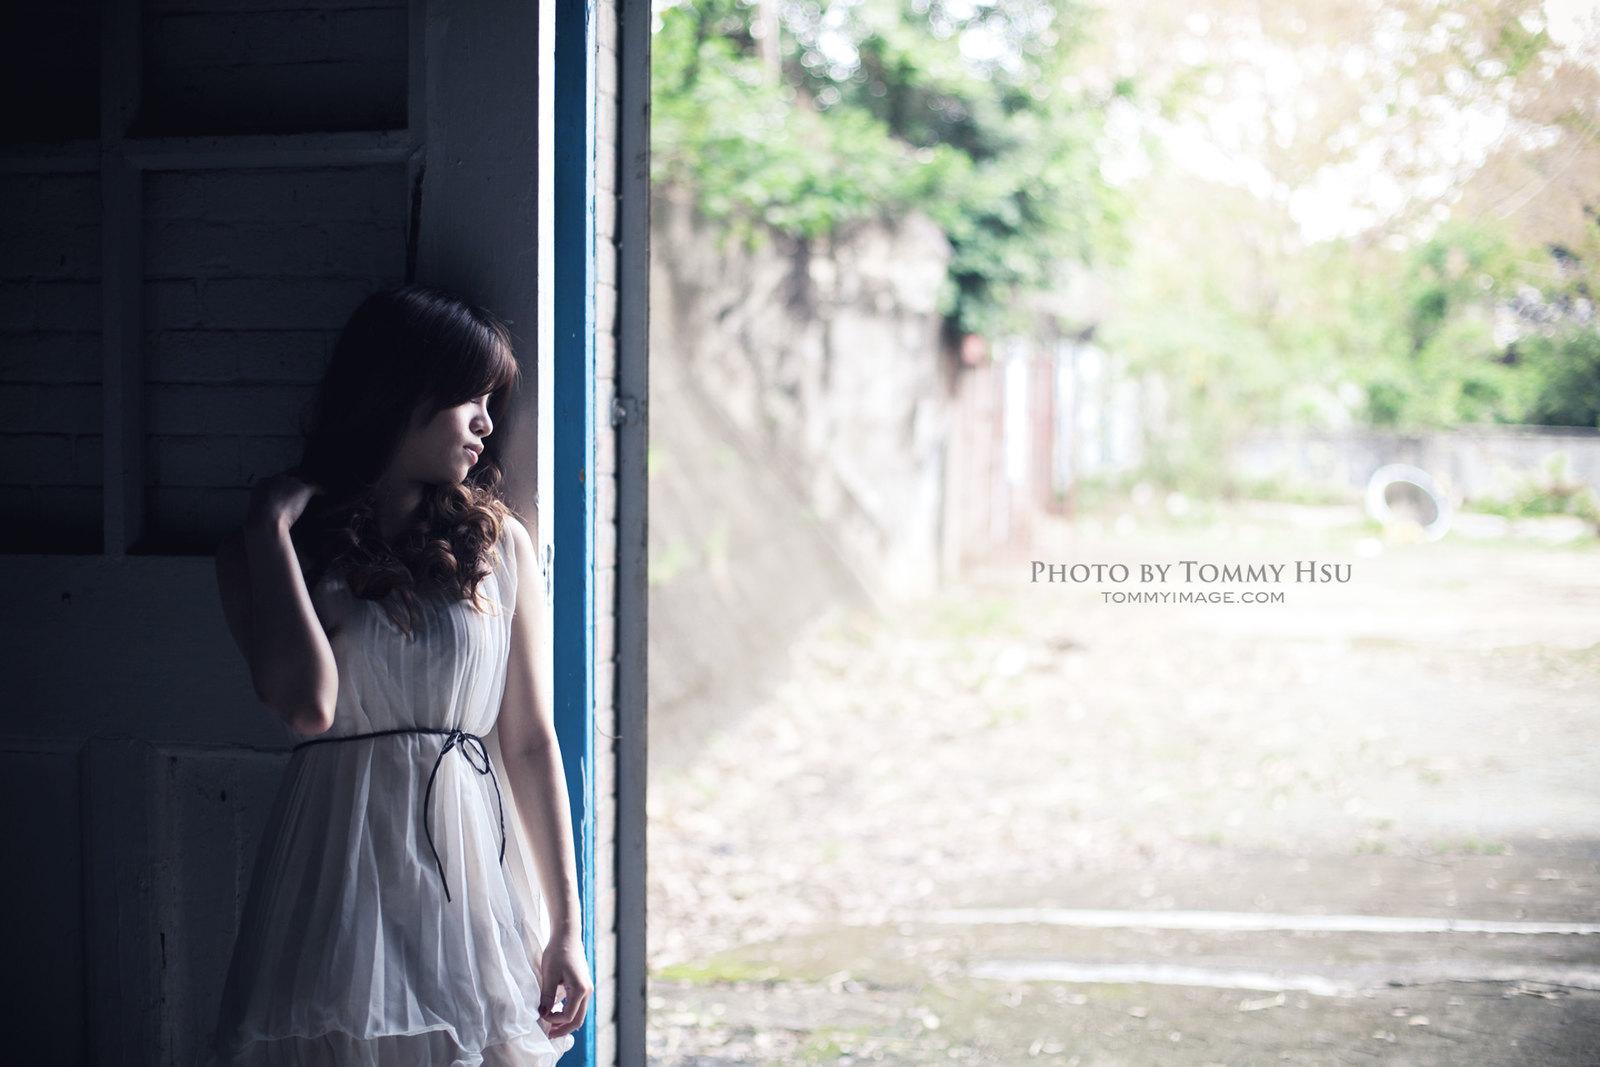 2012.04.21 Pon明德班